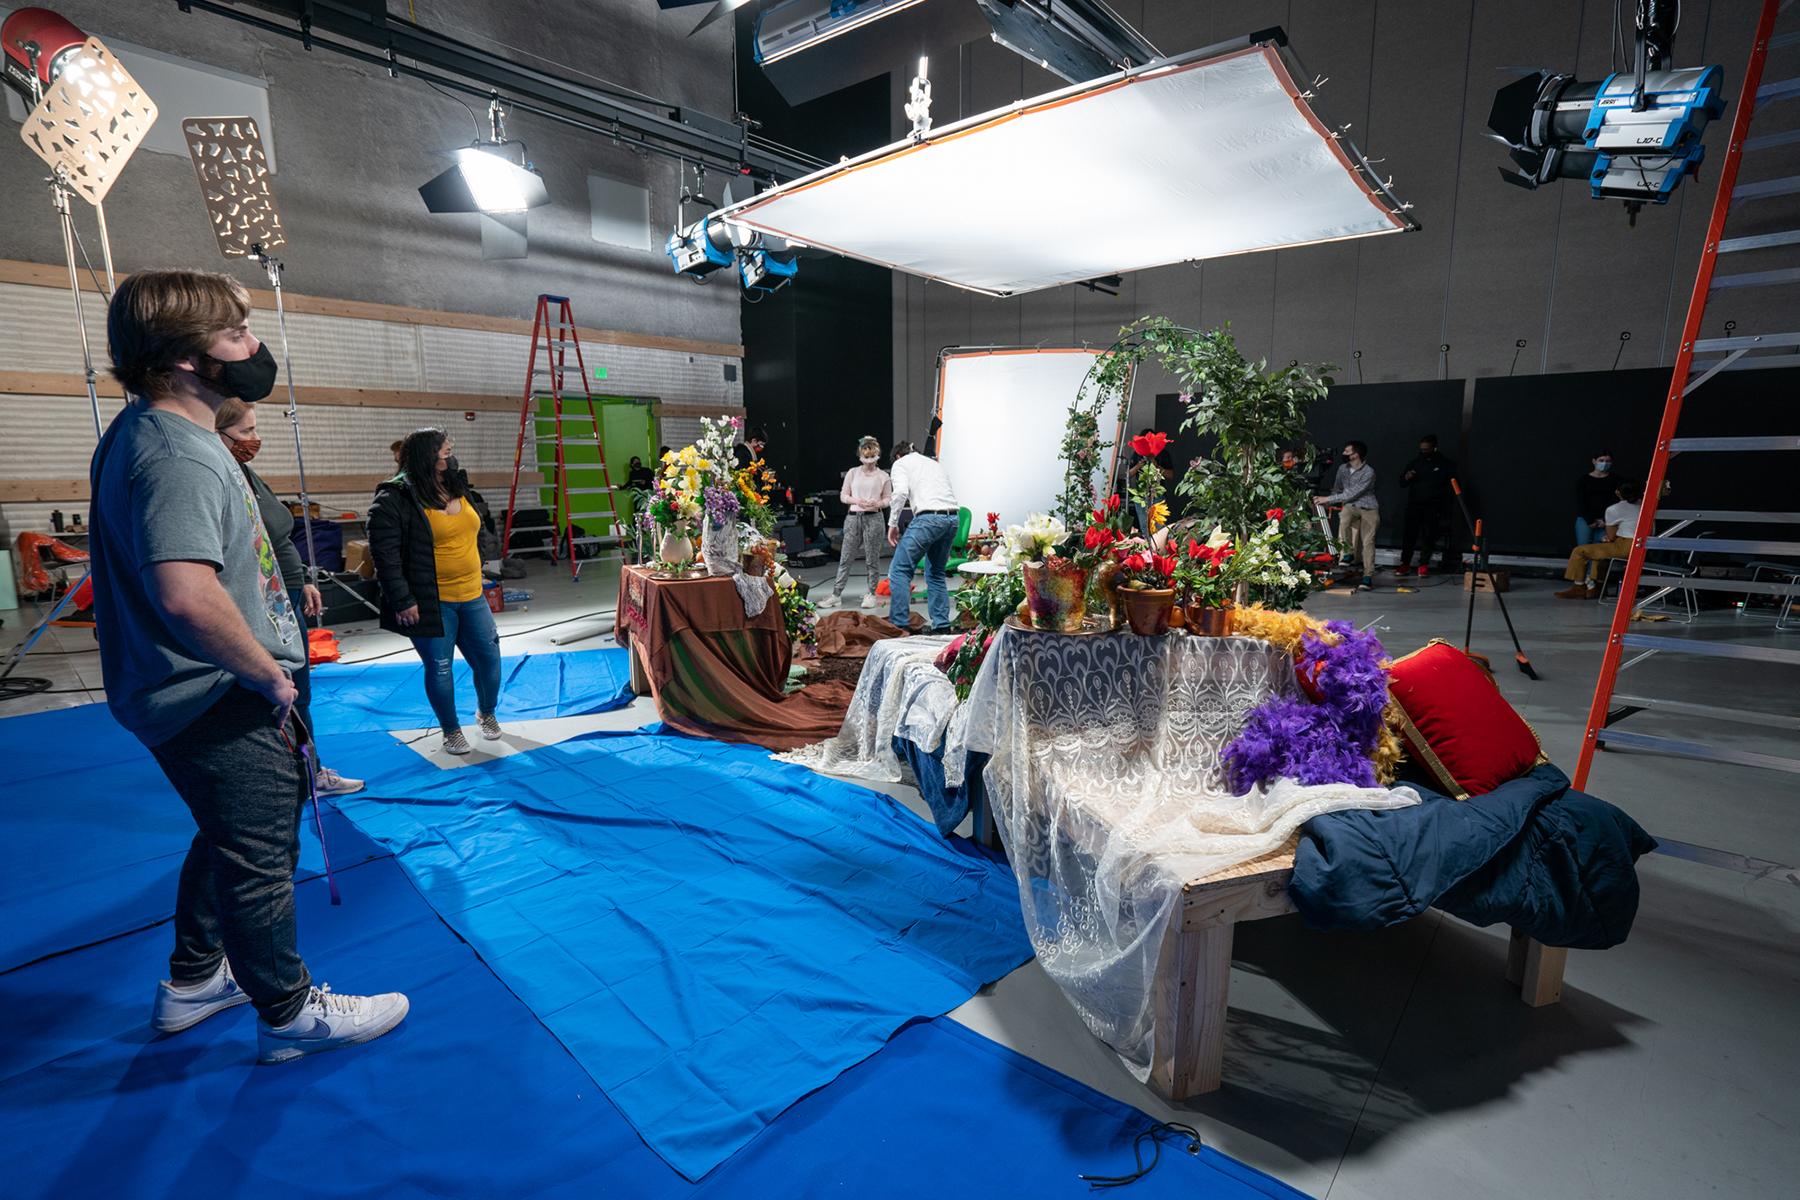 A student film crew surveys the set props.